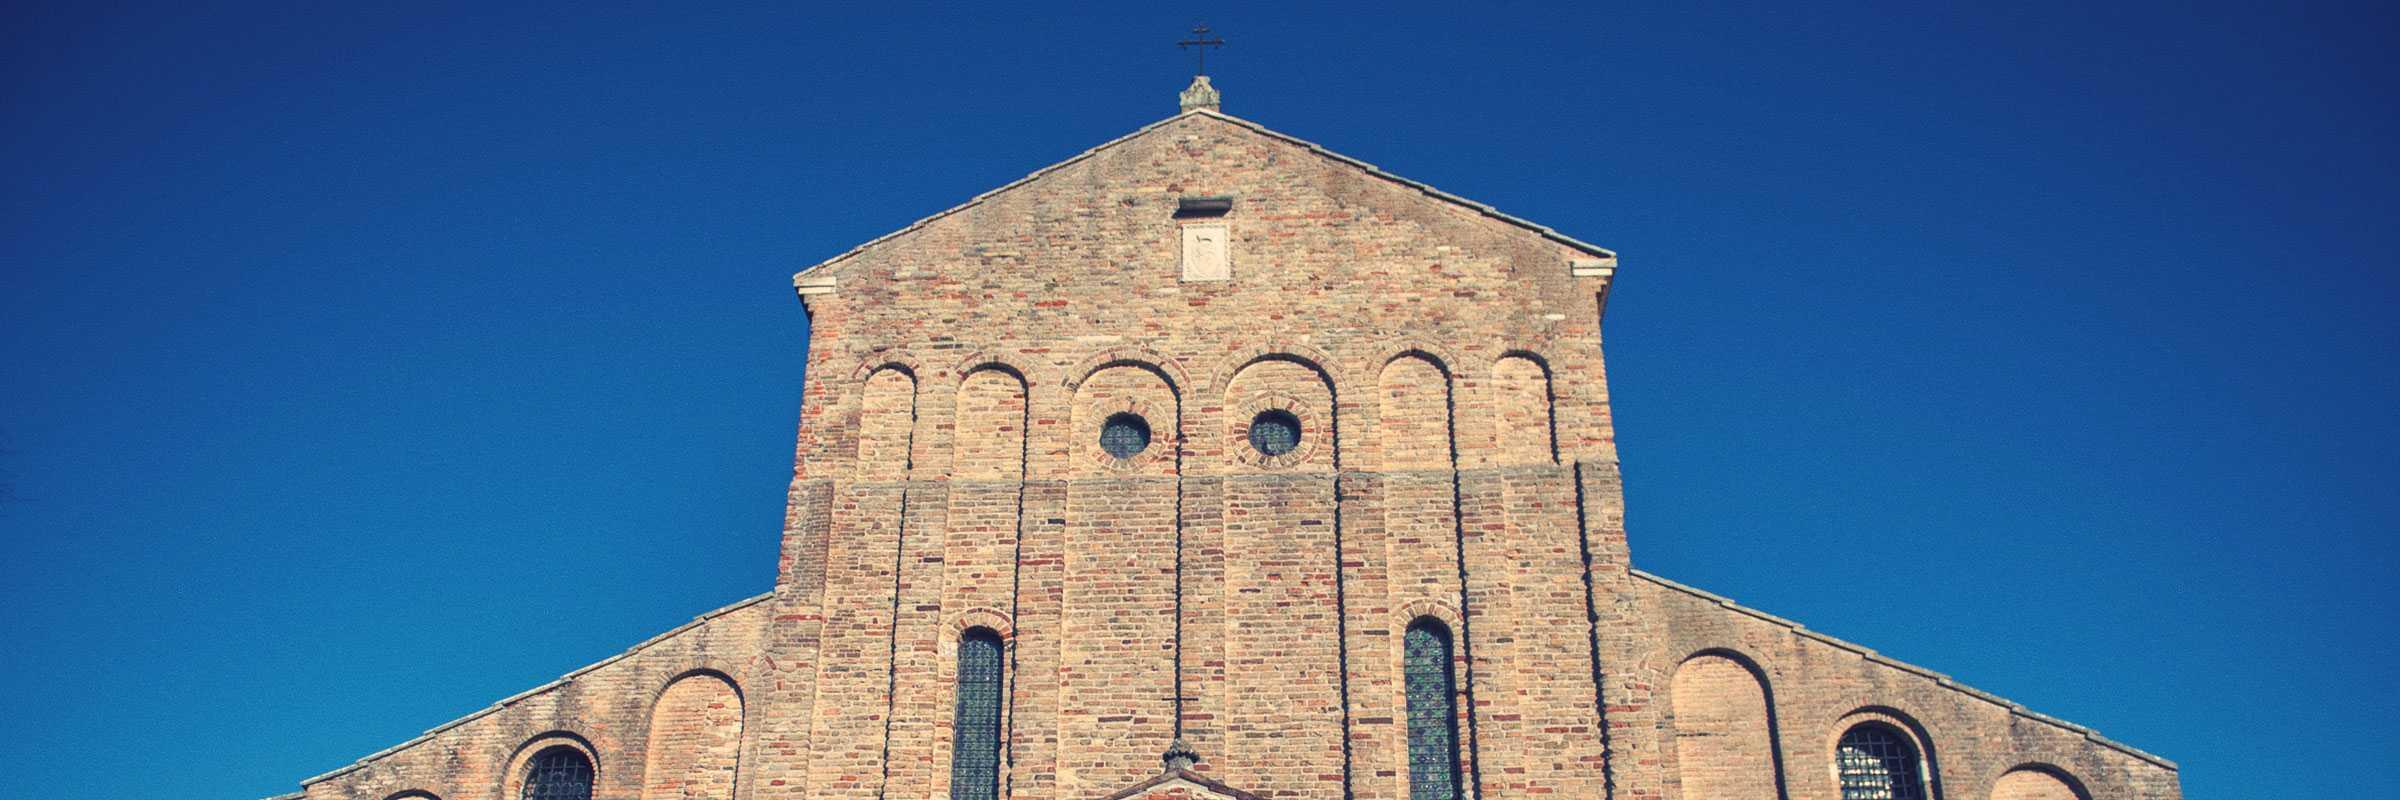 Detail of the facade of the Church of Santa Maria Assunta in Torcello — (Archive Bazzmann/Venipedia)